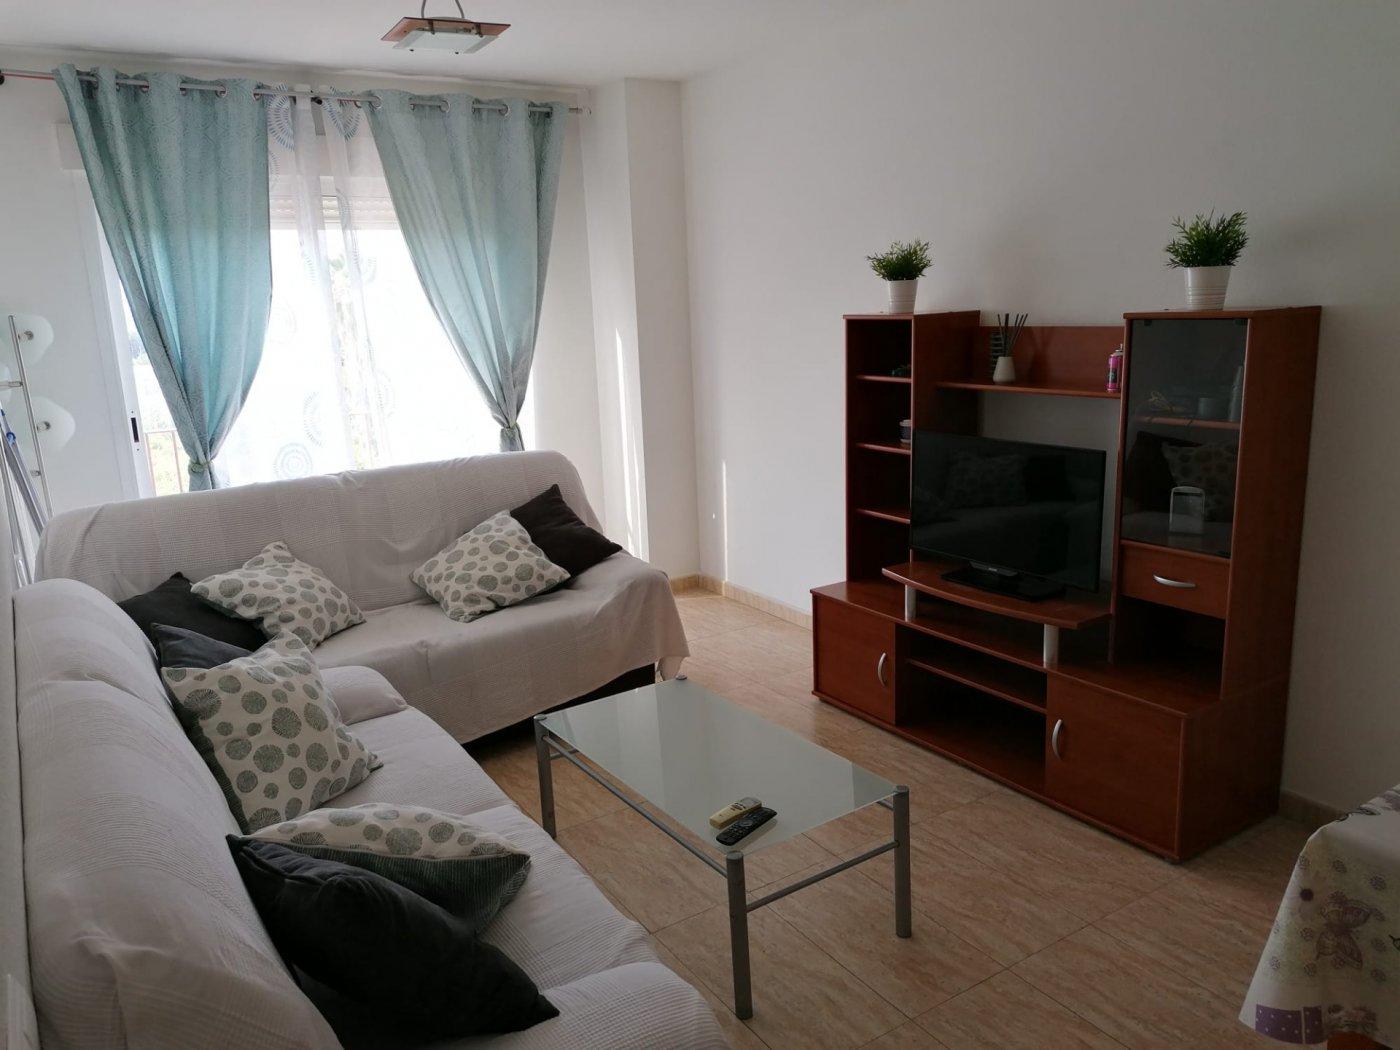 piso en guadalupe-de-maciascoque · guadalupe 0€